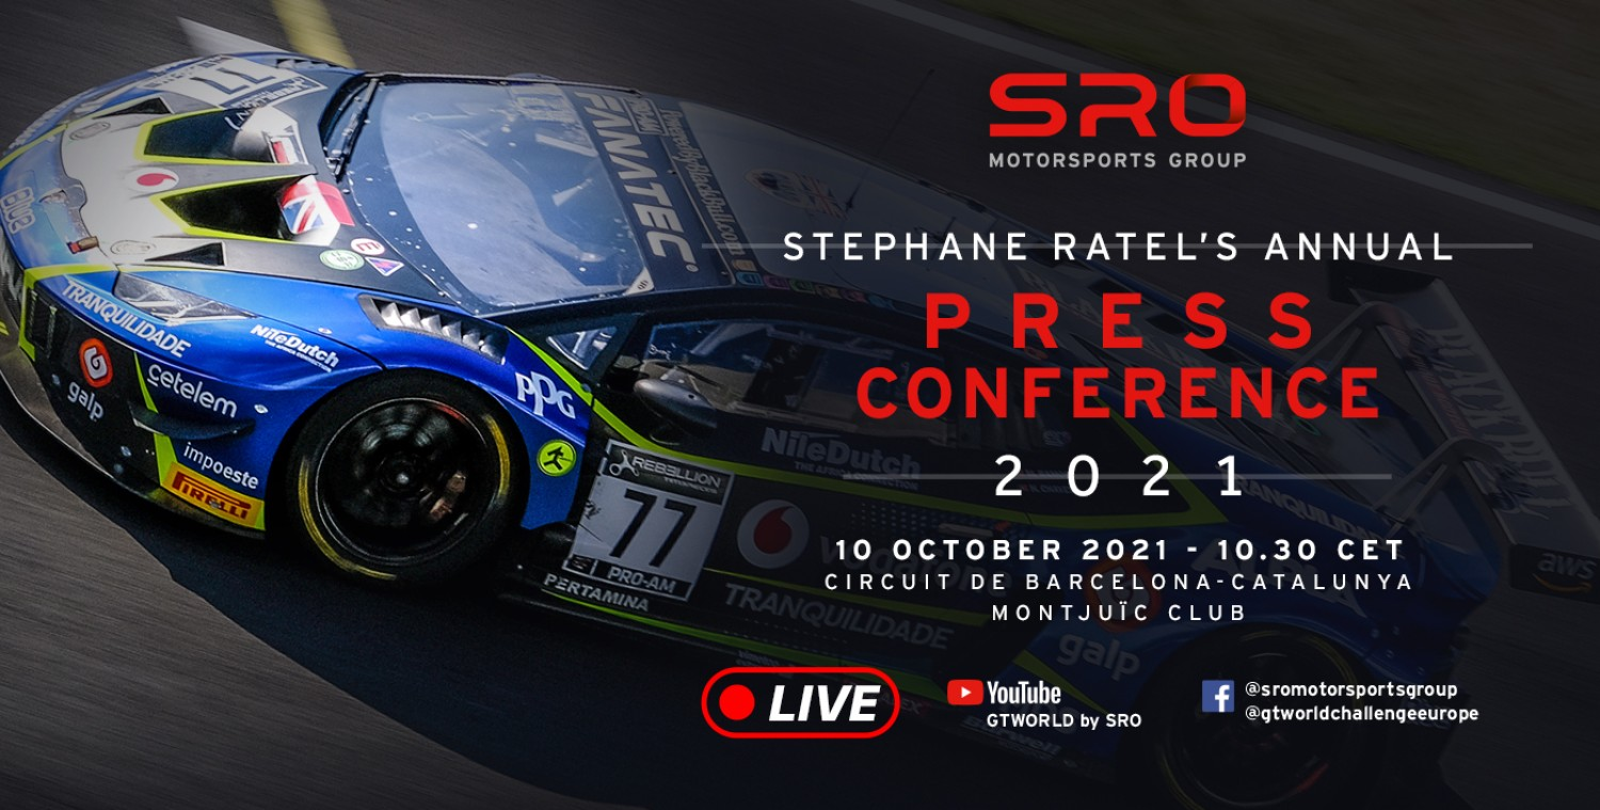 SRO Motorsports Group 2022 Press Conference - LIVE